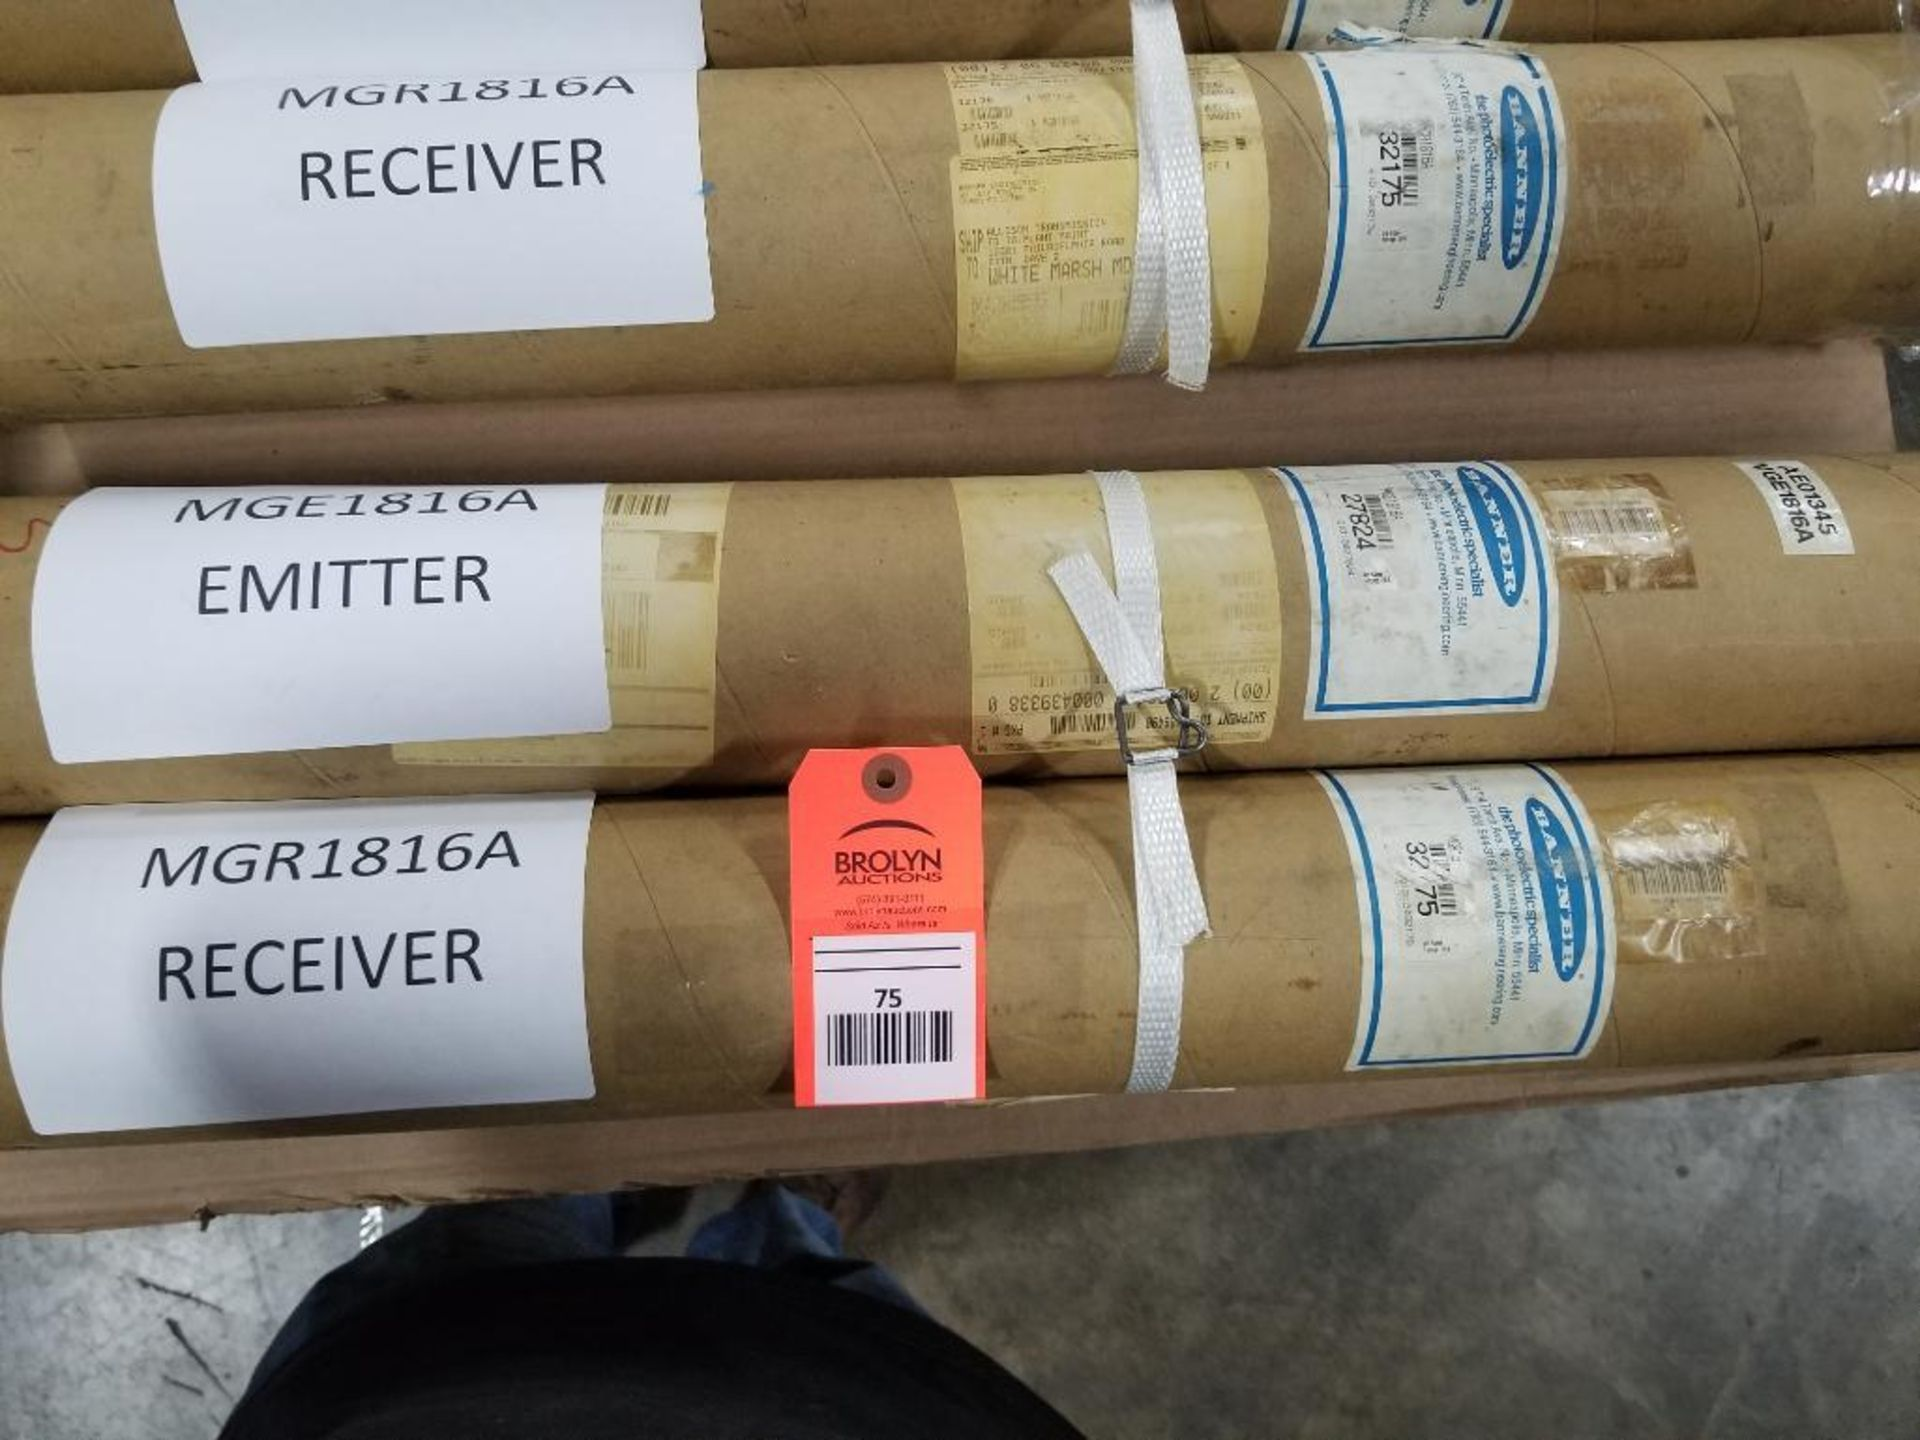 Banner Light curtain transmitter / receiver set. MGE1816A 27824, MGR1816A 32175.